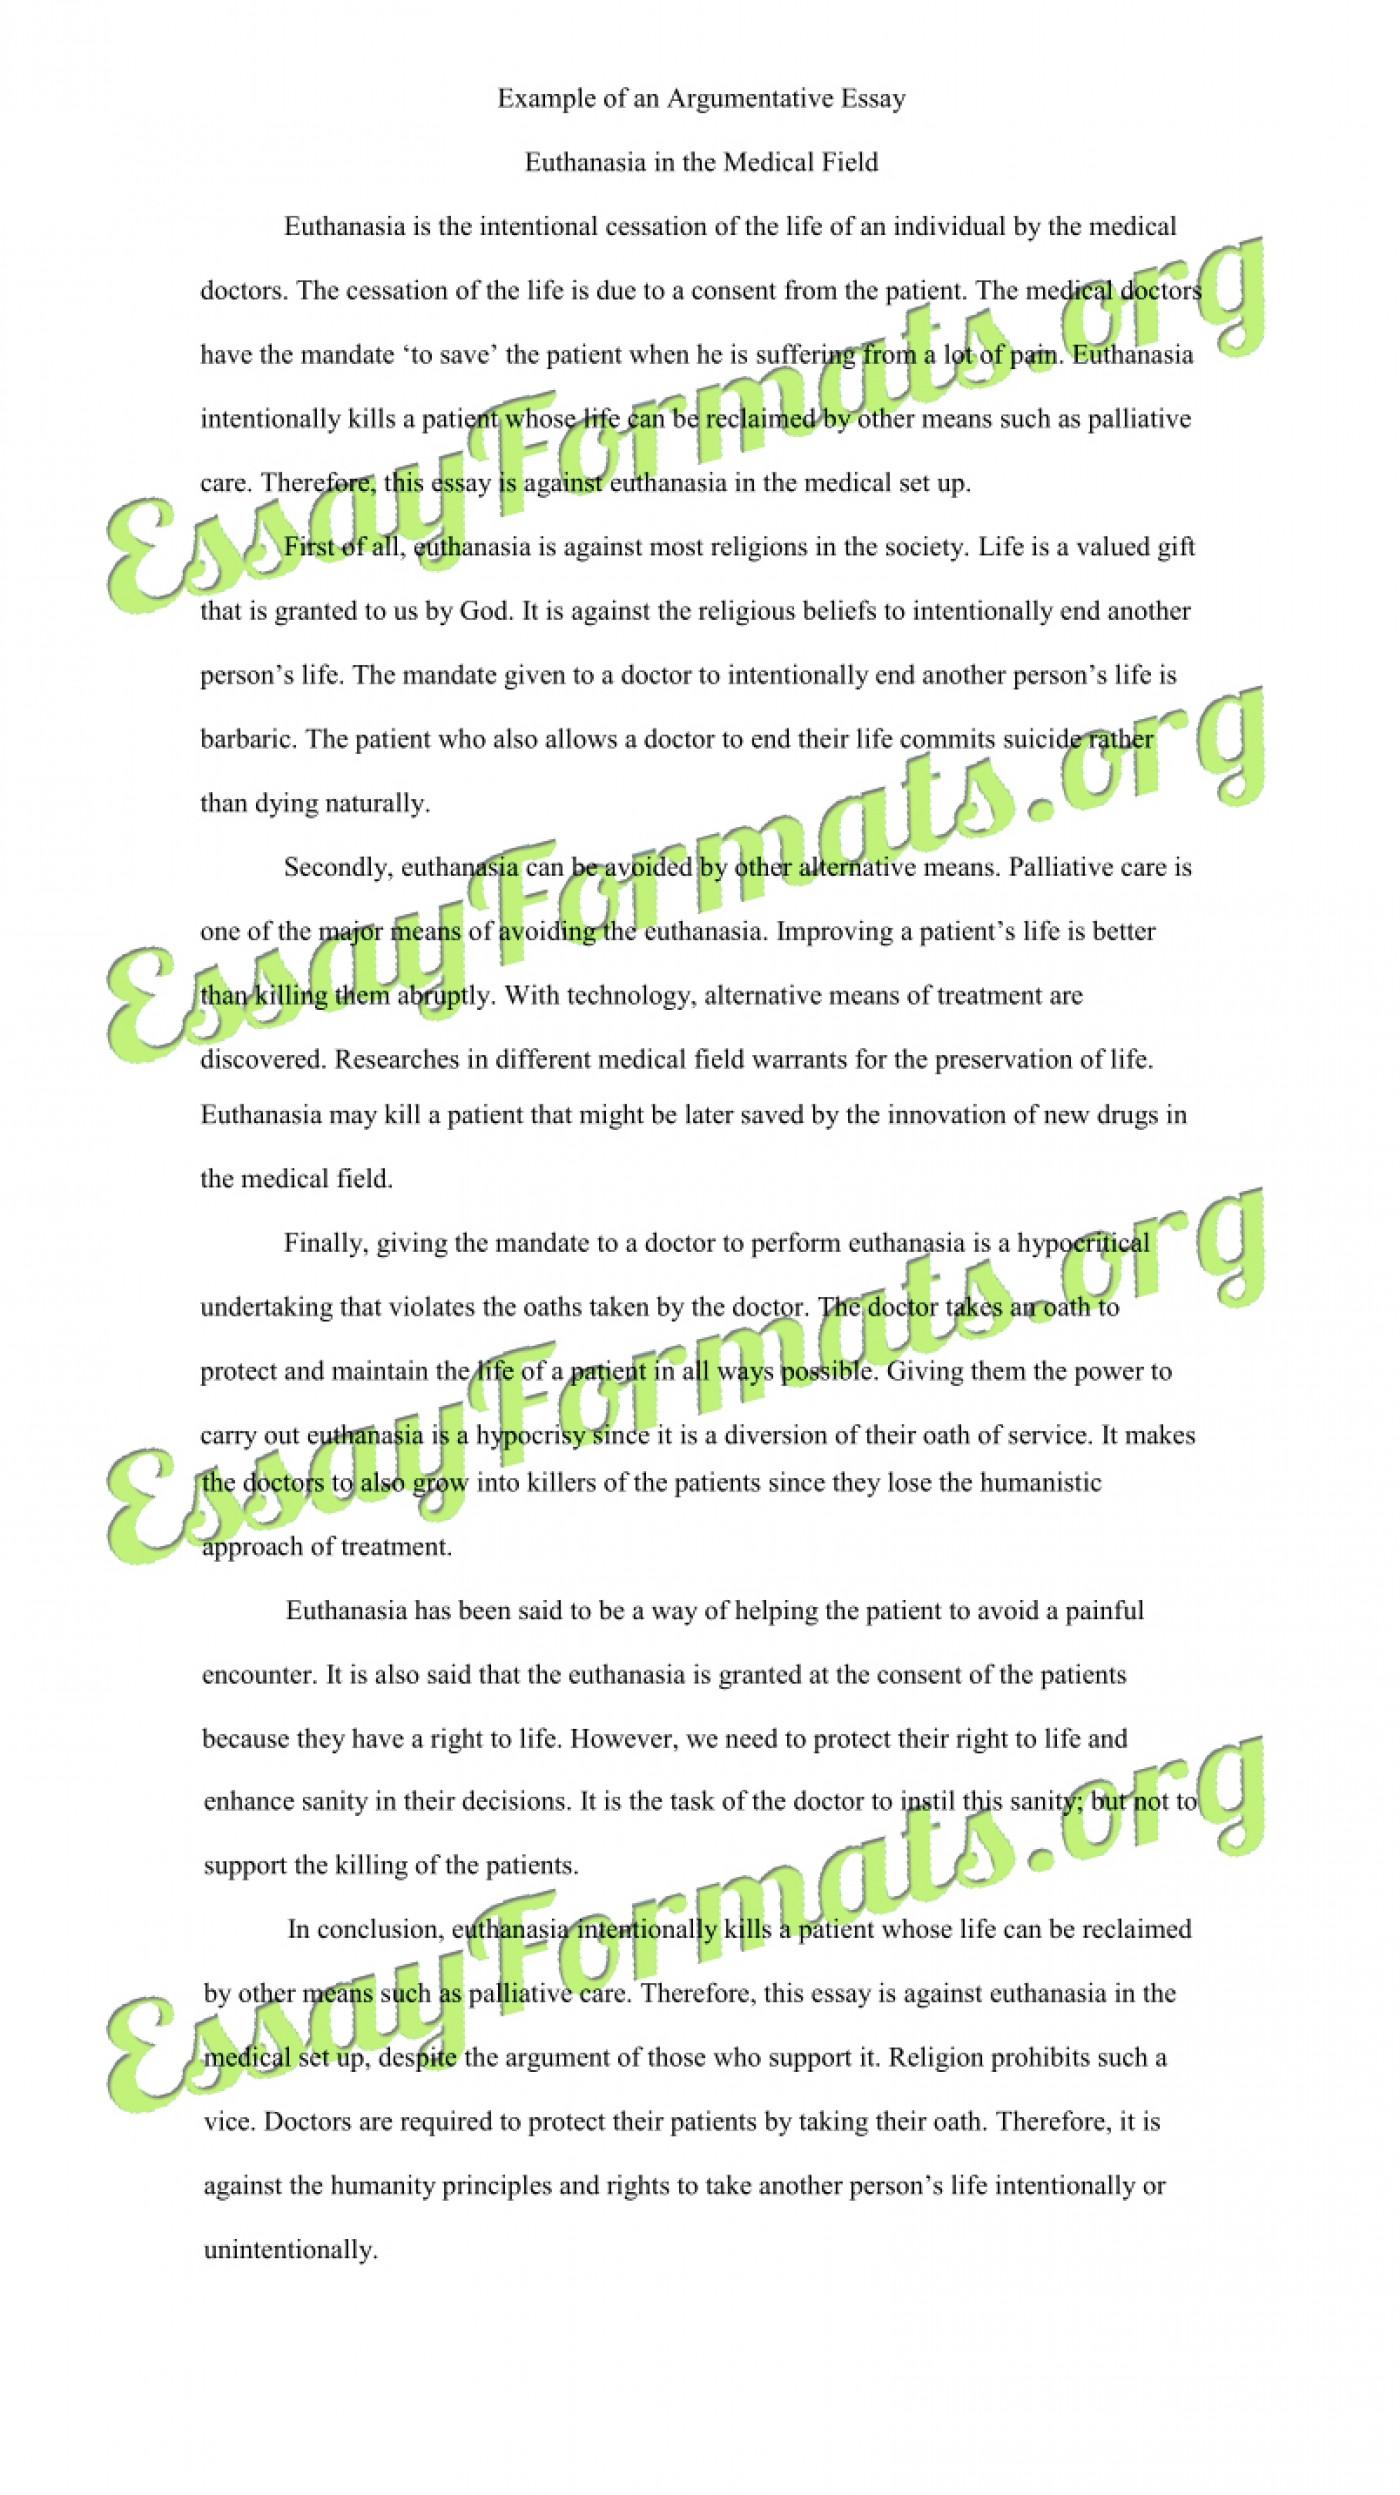 005 Essay Example Euthanasia Argumentative Counter Argument Persuasive Examples L Stirring Pdf Introduction Outline 1400